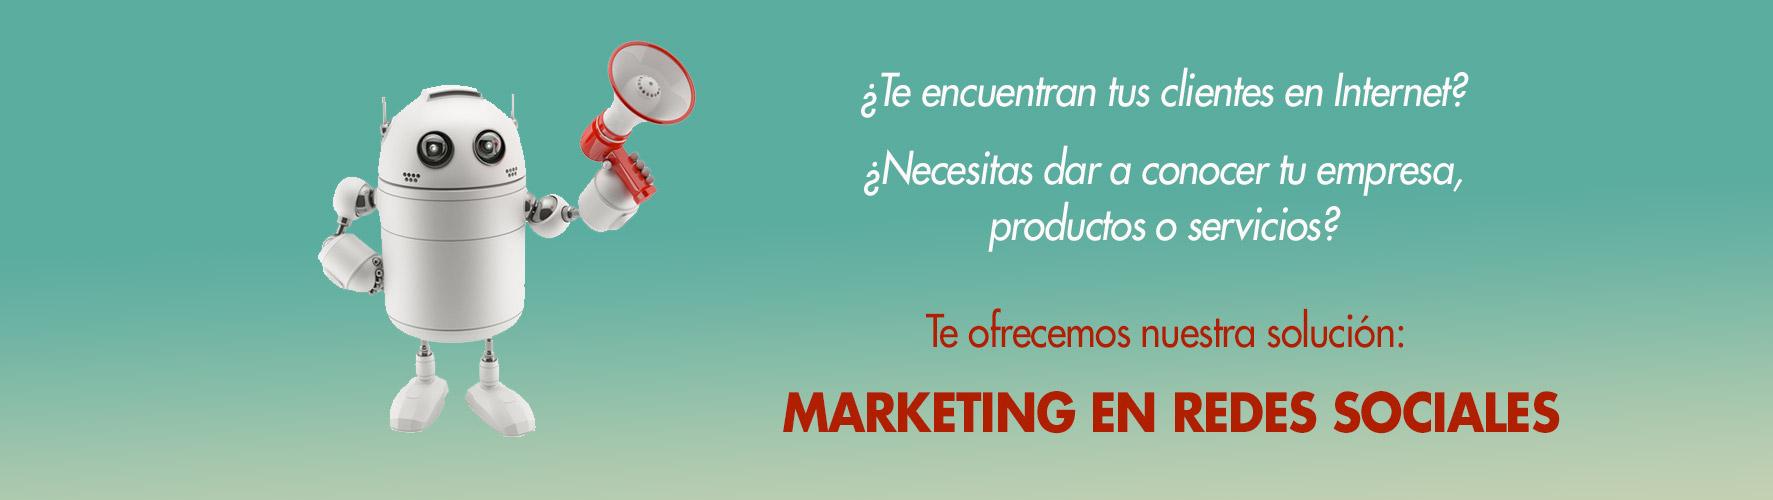 MarketingRedesSociales